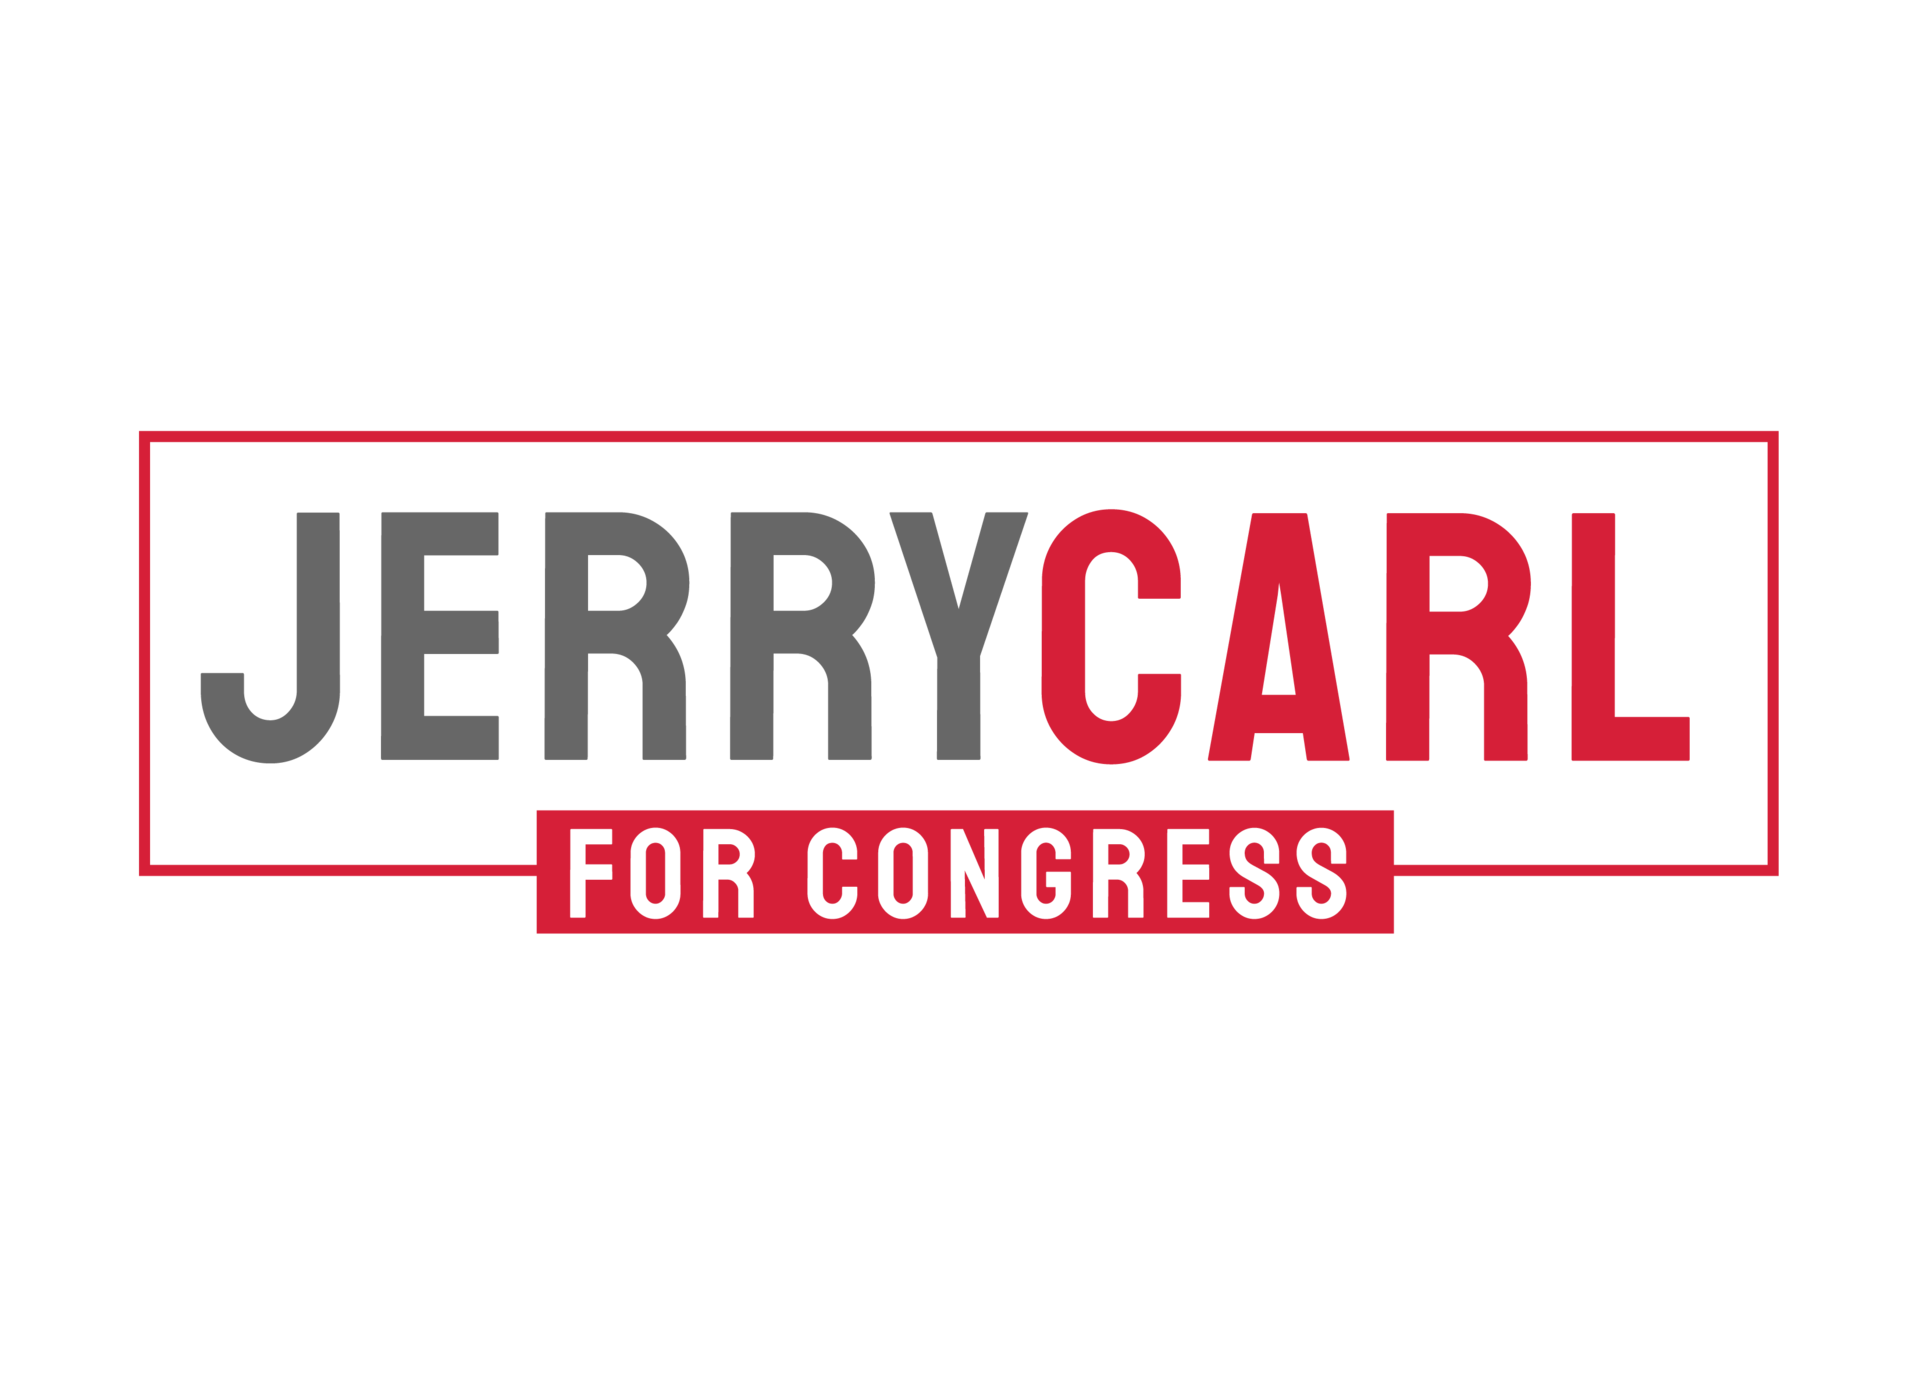 Jerry carl logo fullcolor